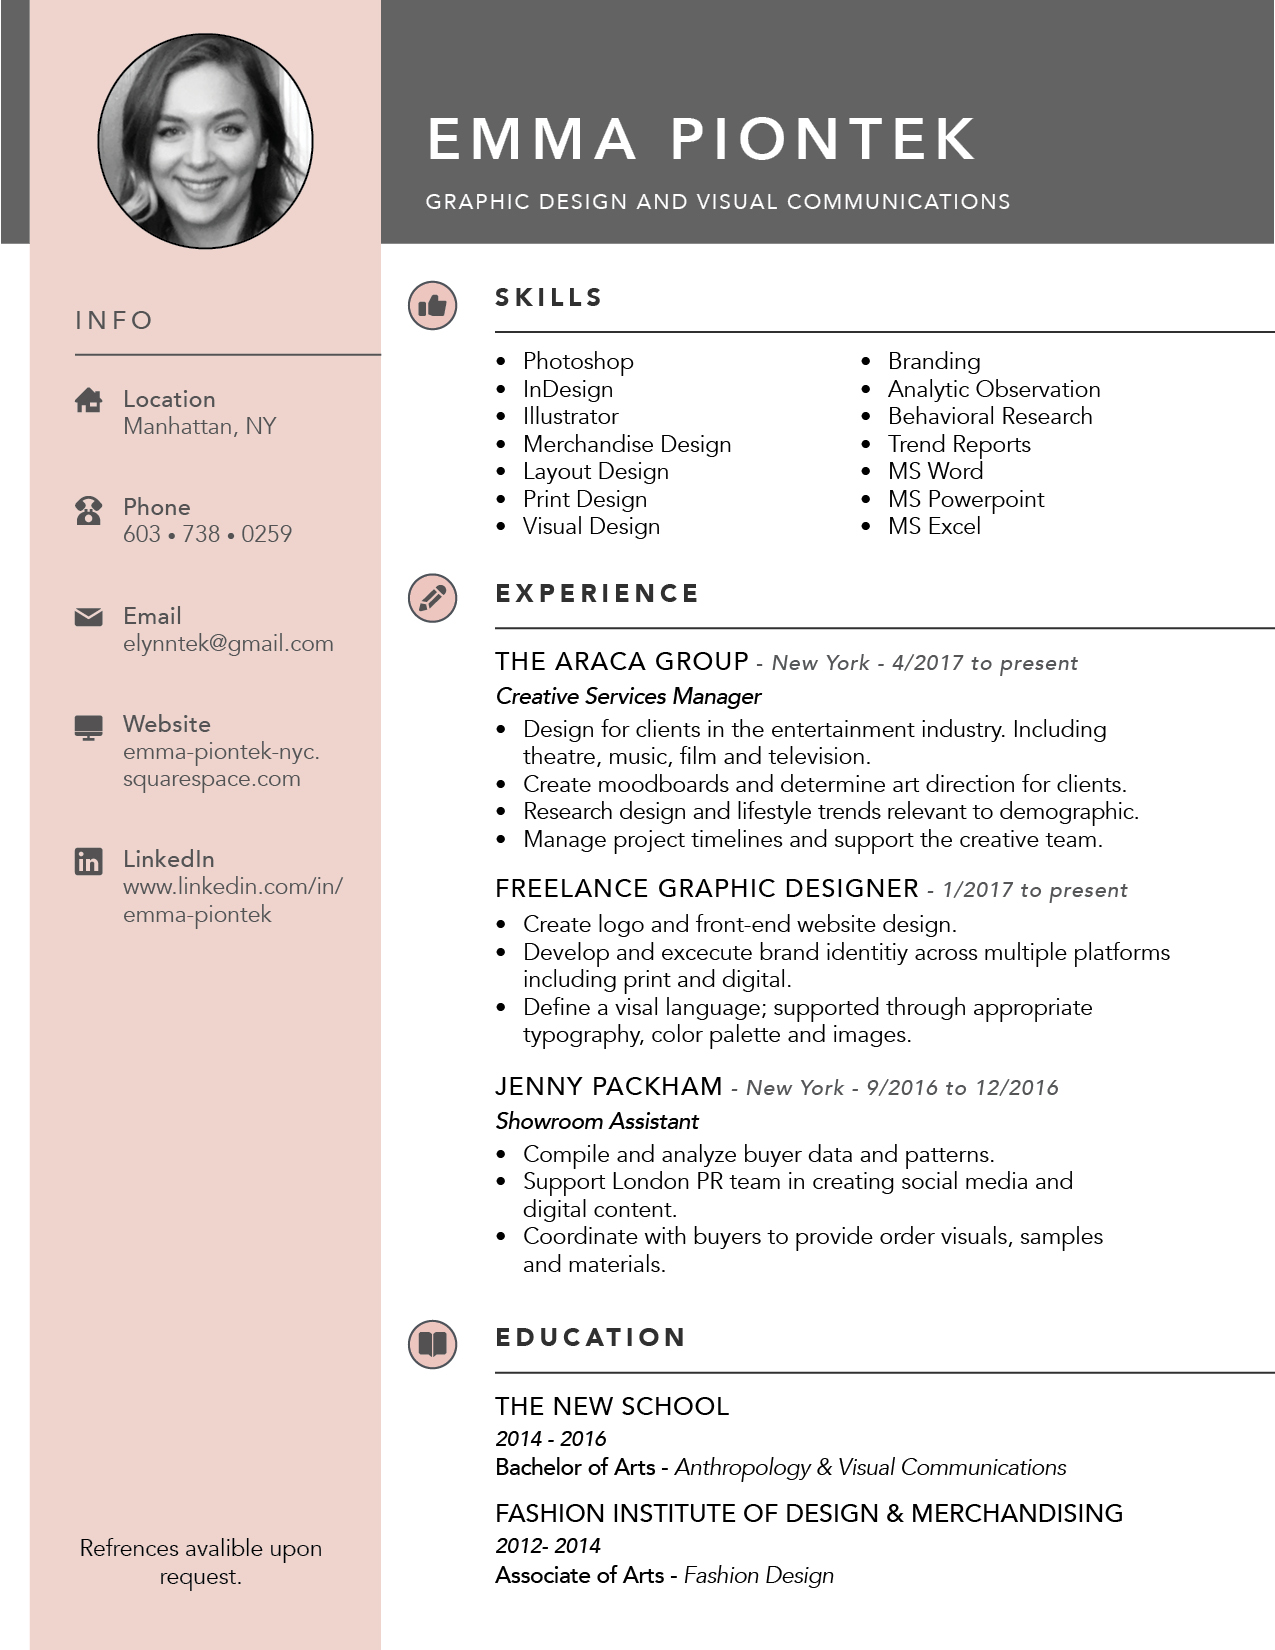 Resume-2018.jpg